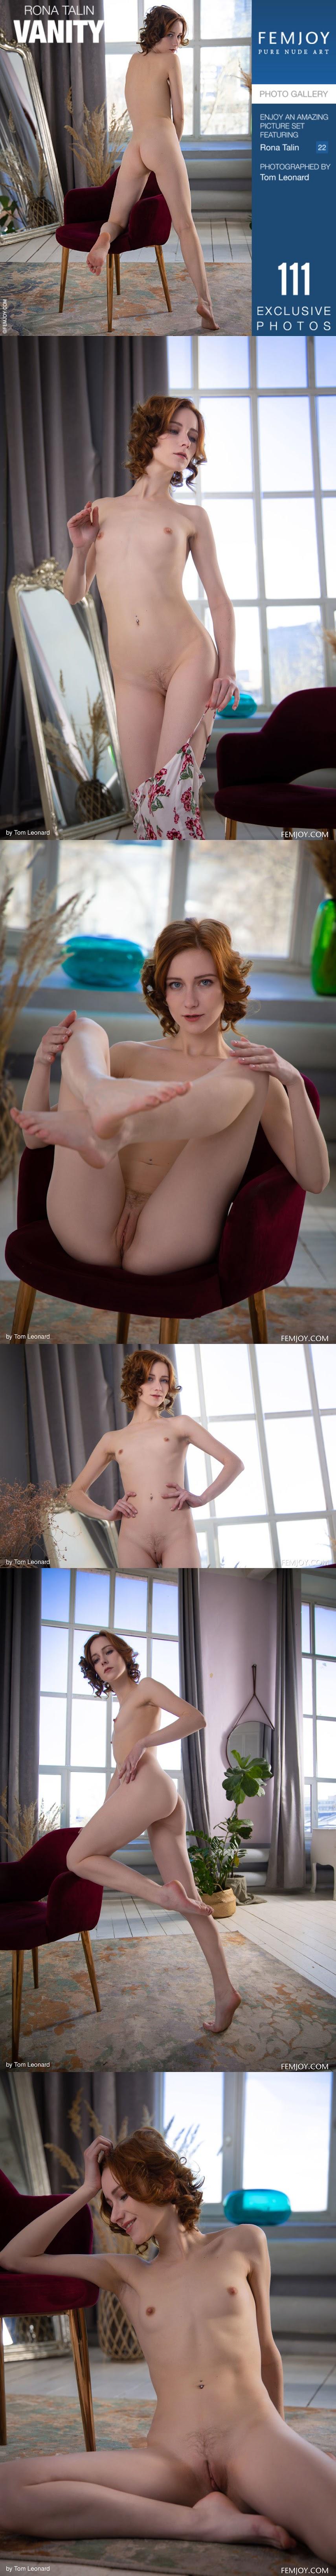 Rona Talin - Vanity sexy girls image jav